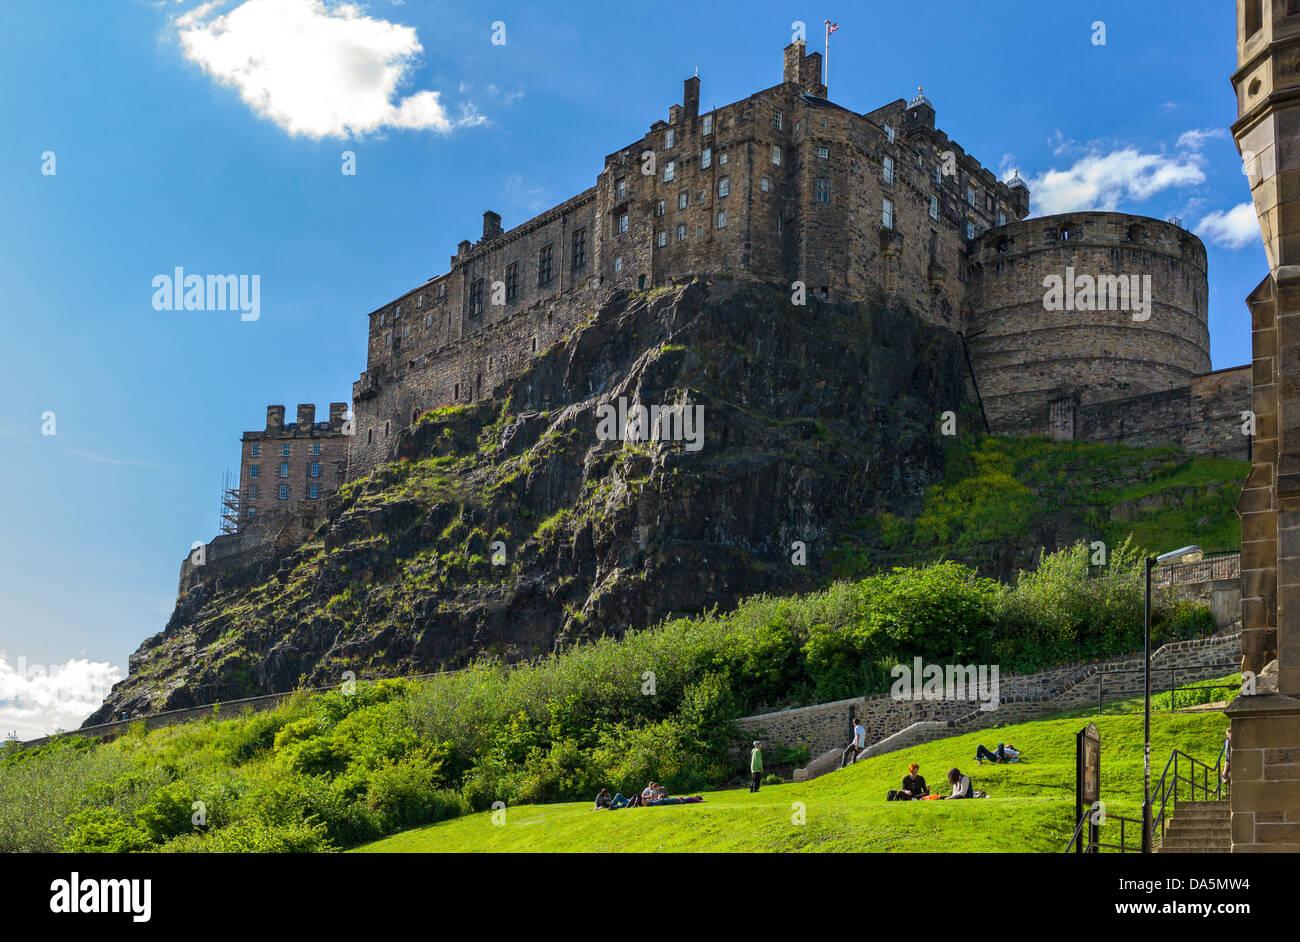 Europe Great Britain, Scotland, Edinburgh, the Castle seen from the Grassmarket area. - Stock Image